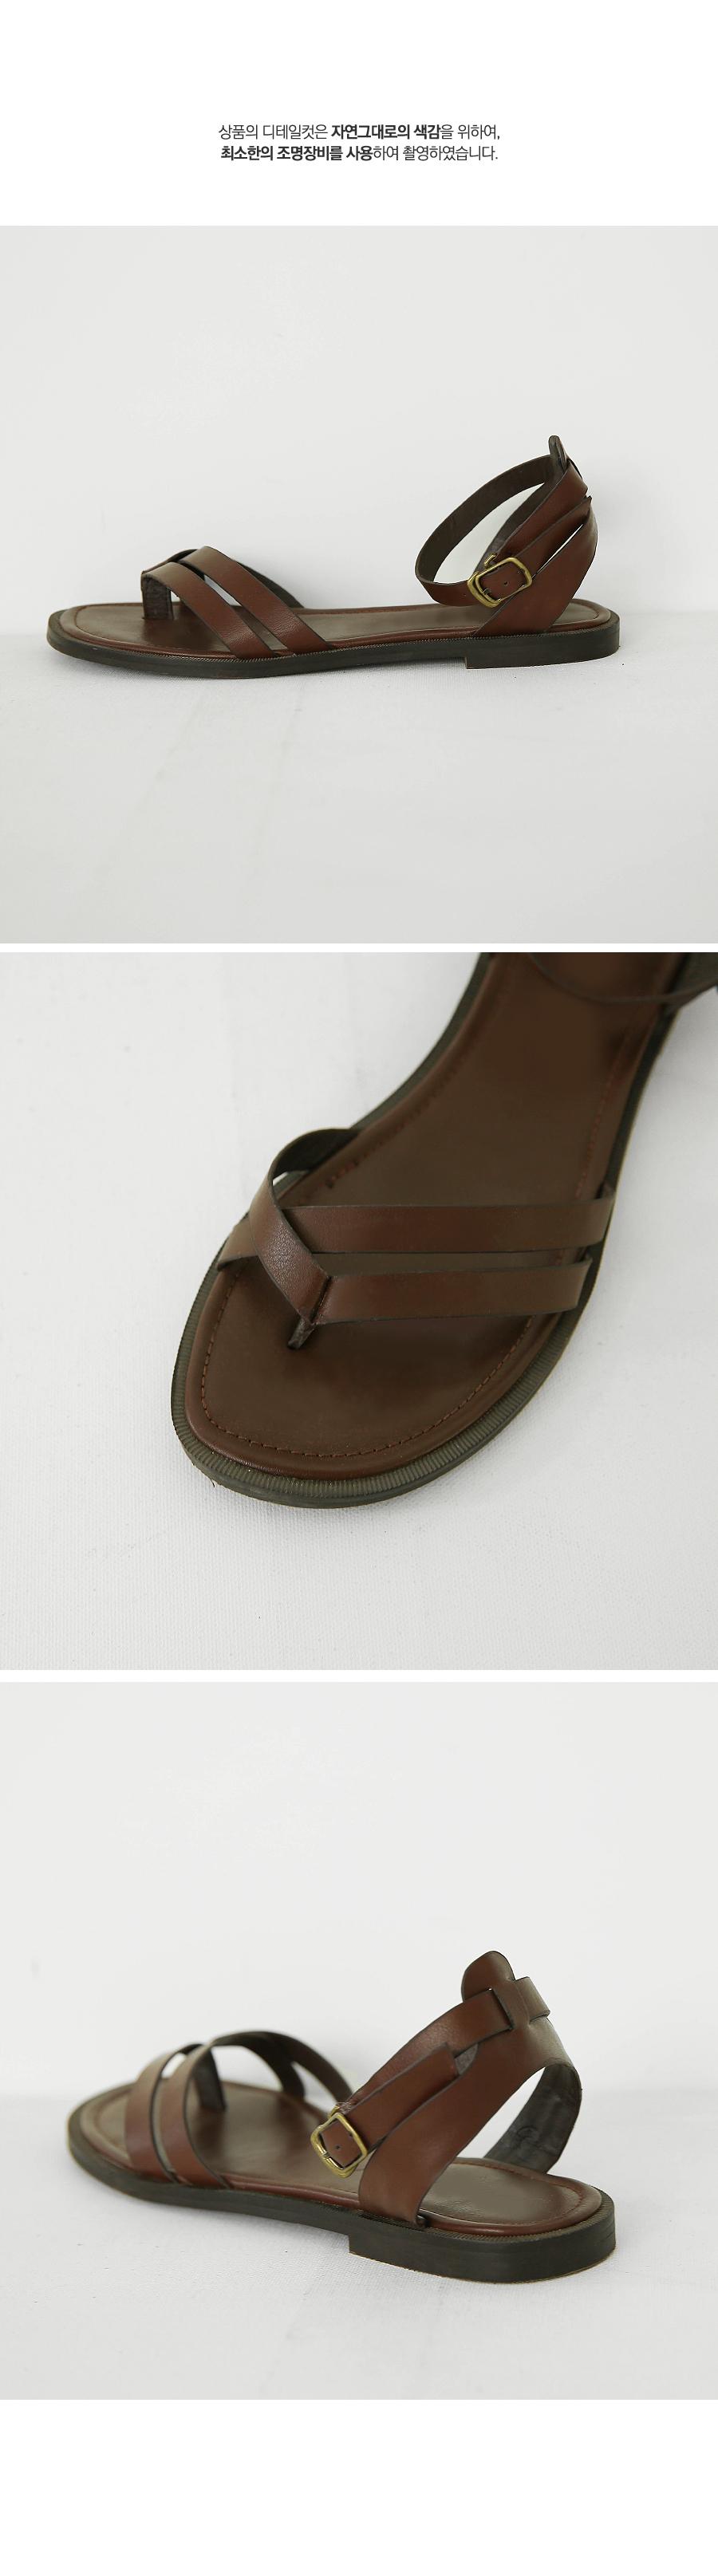 Buckleline strap sandals